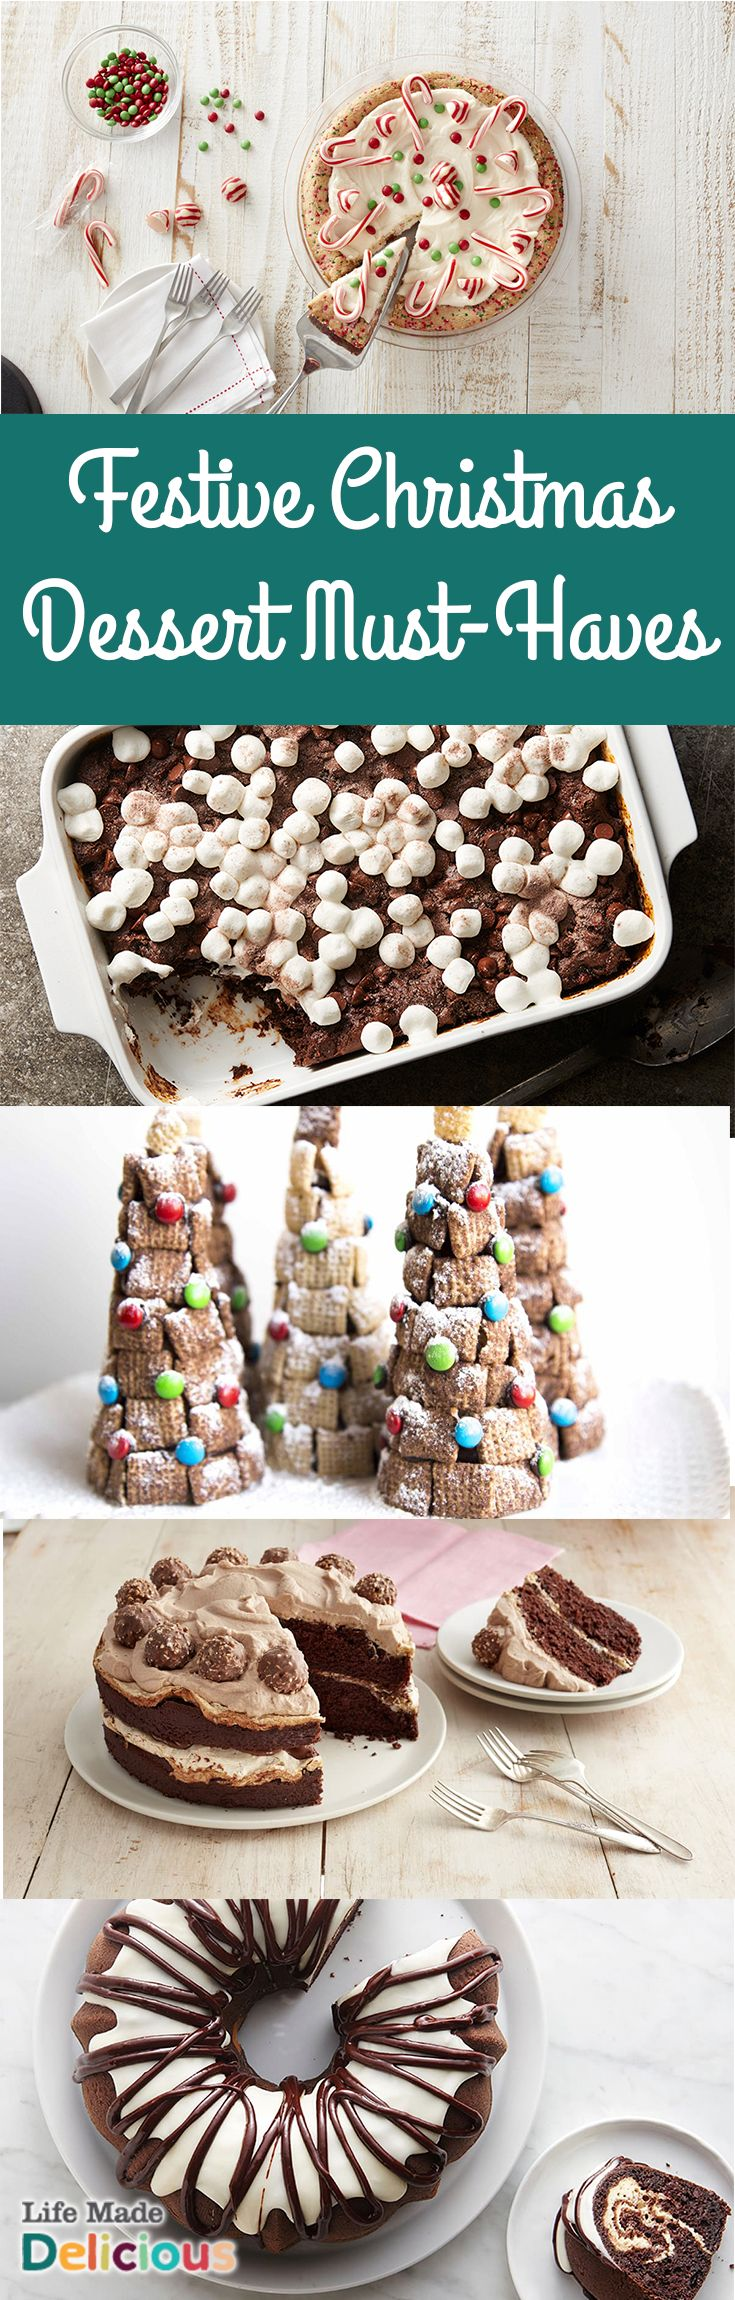 Festive Christmas Dessert Must-Haves